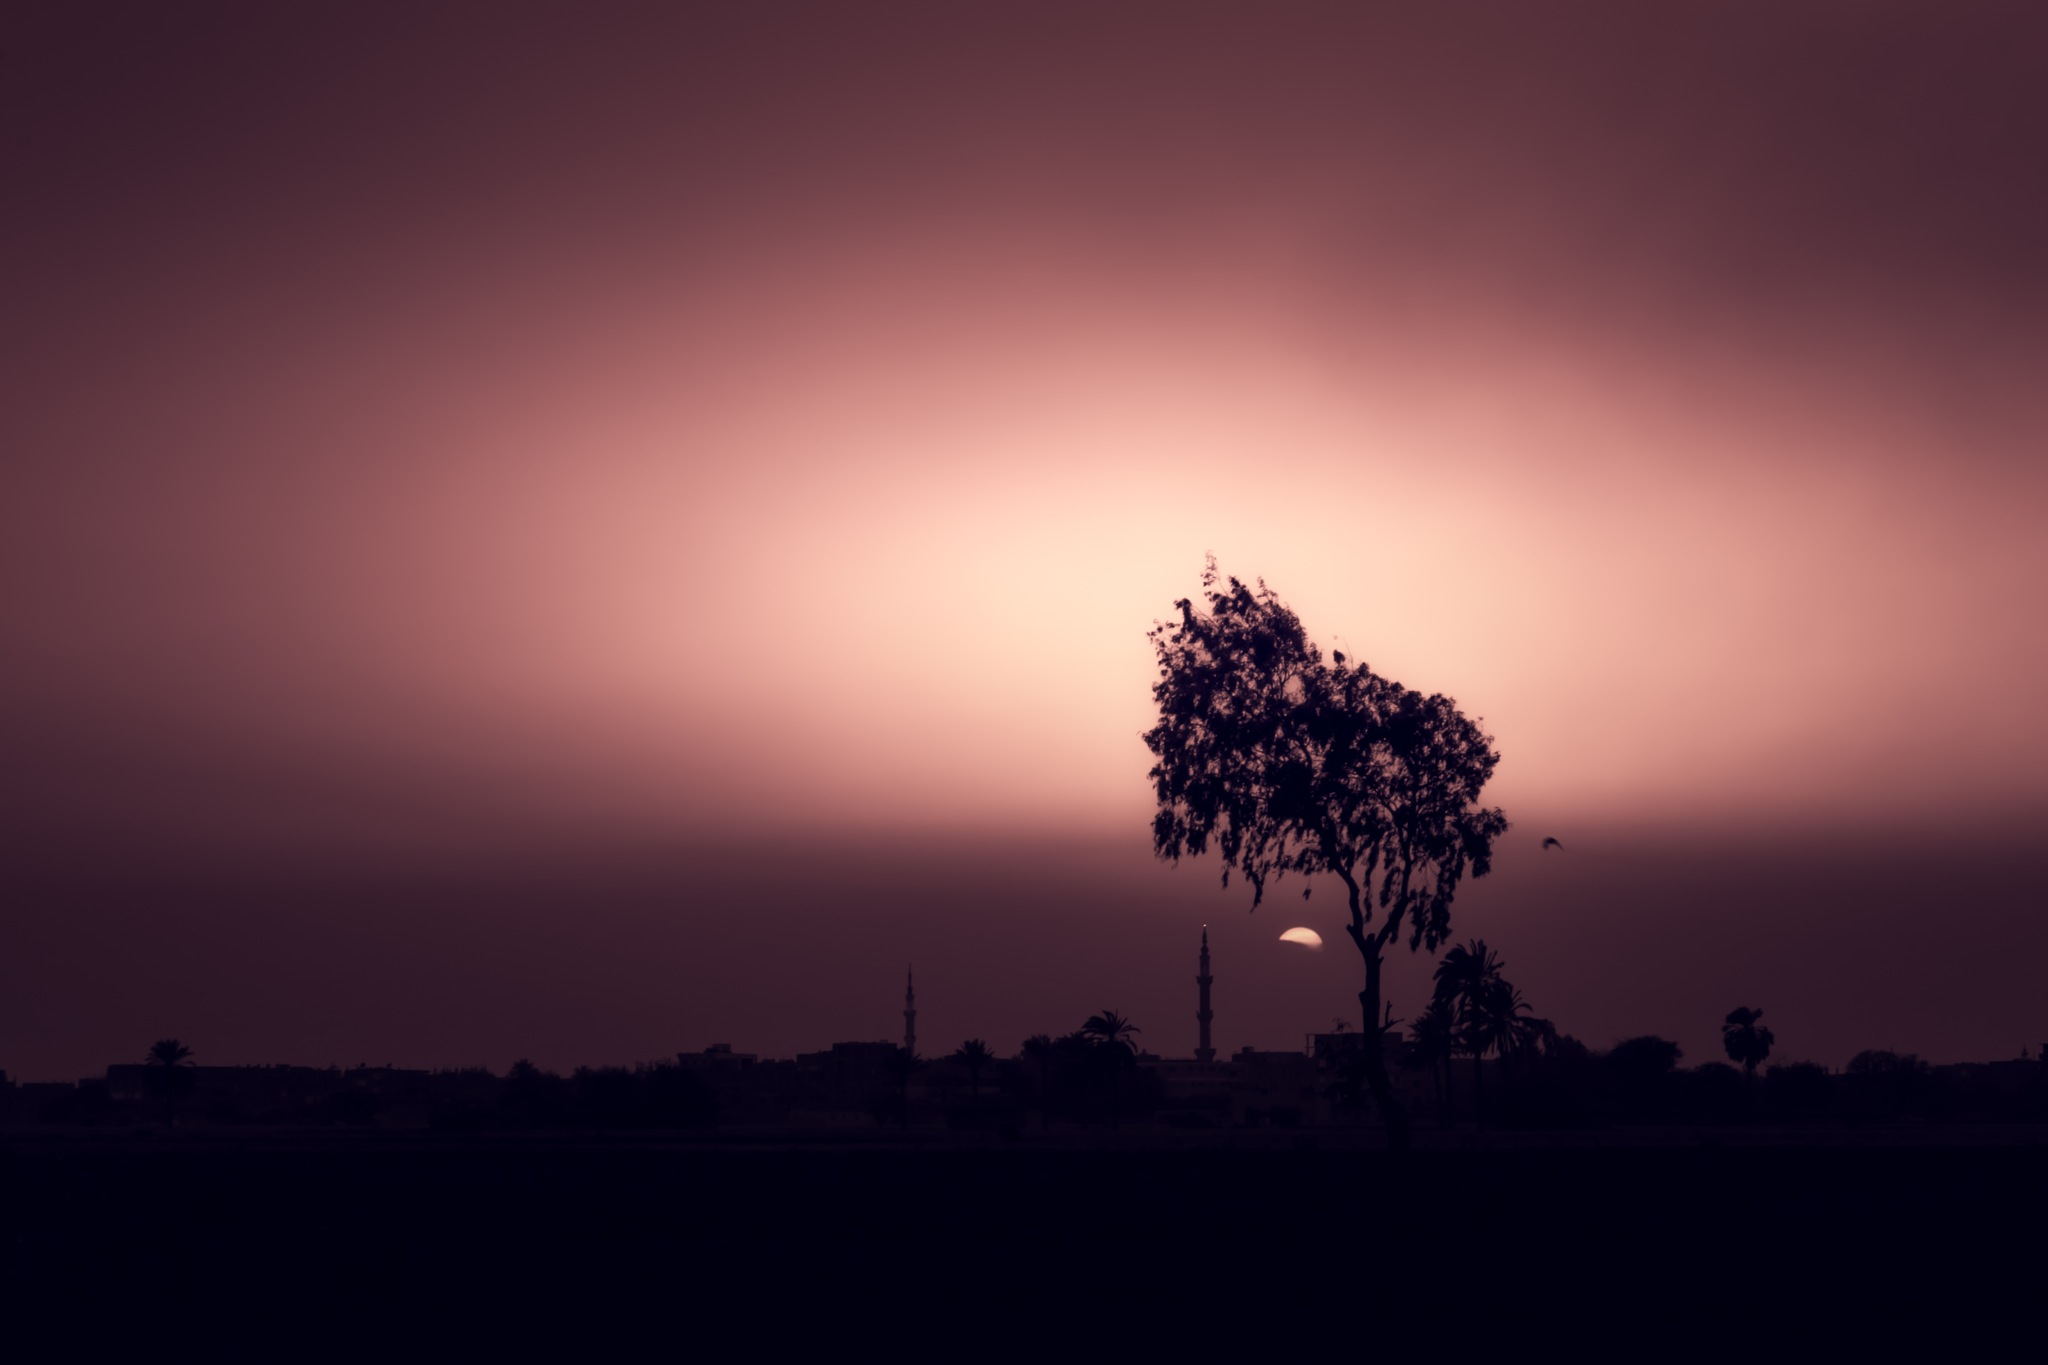 Last light  by Abdulaziz Seddik